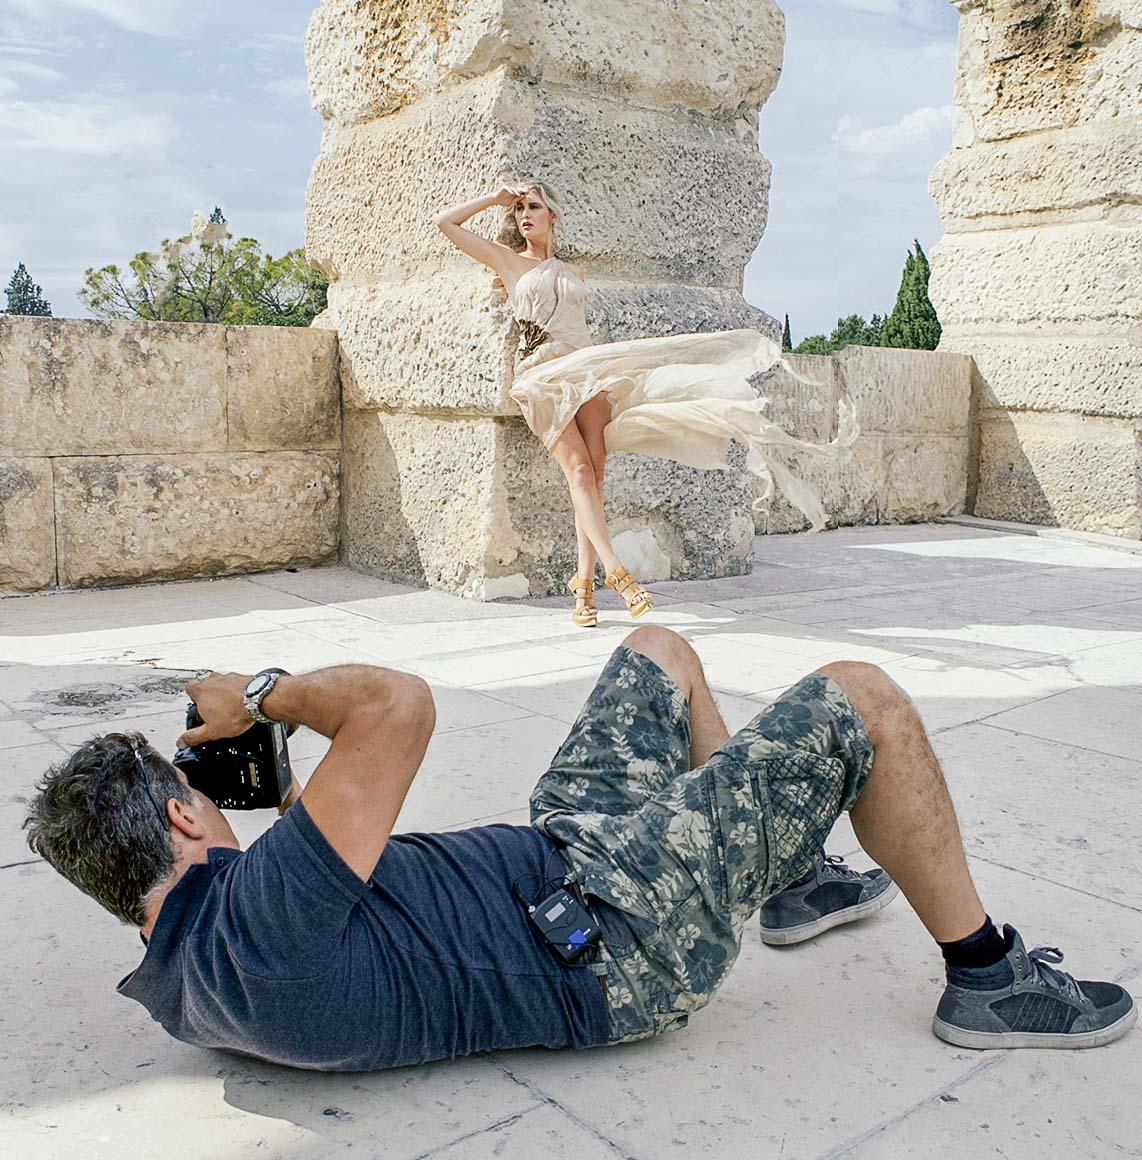 photographers blog